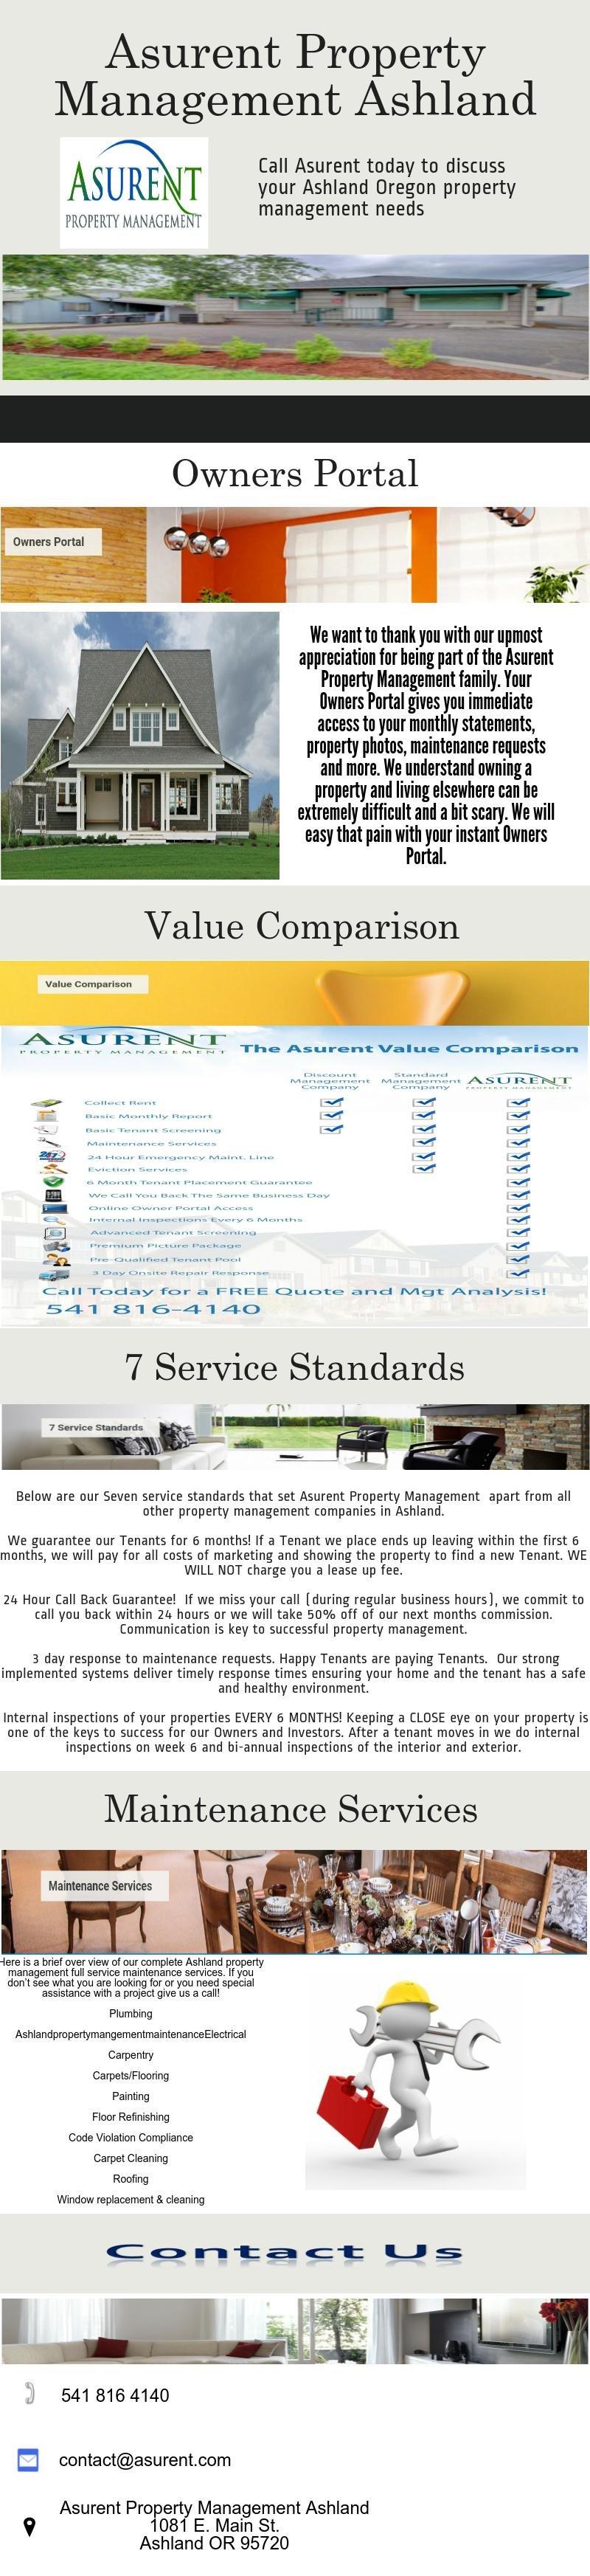 Asurent Property Management Ashland Oregon Is The Premier Full Service Management Company Serving Ashland Oregon Property Management Management Rental Income